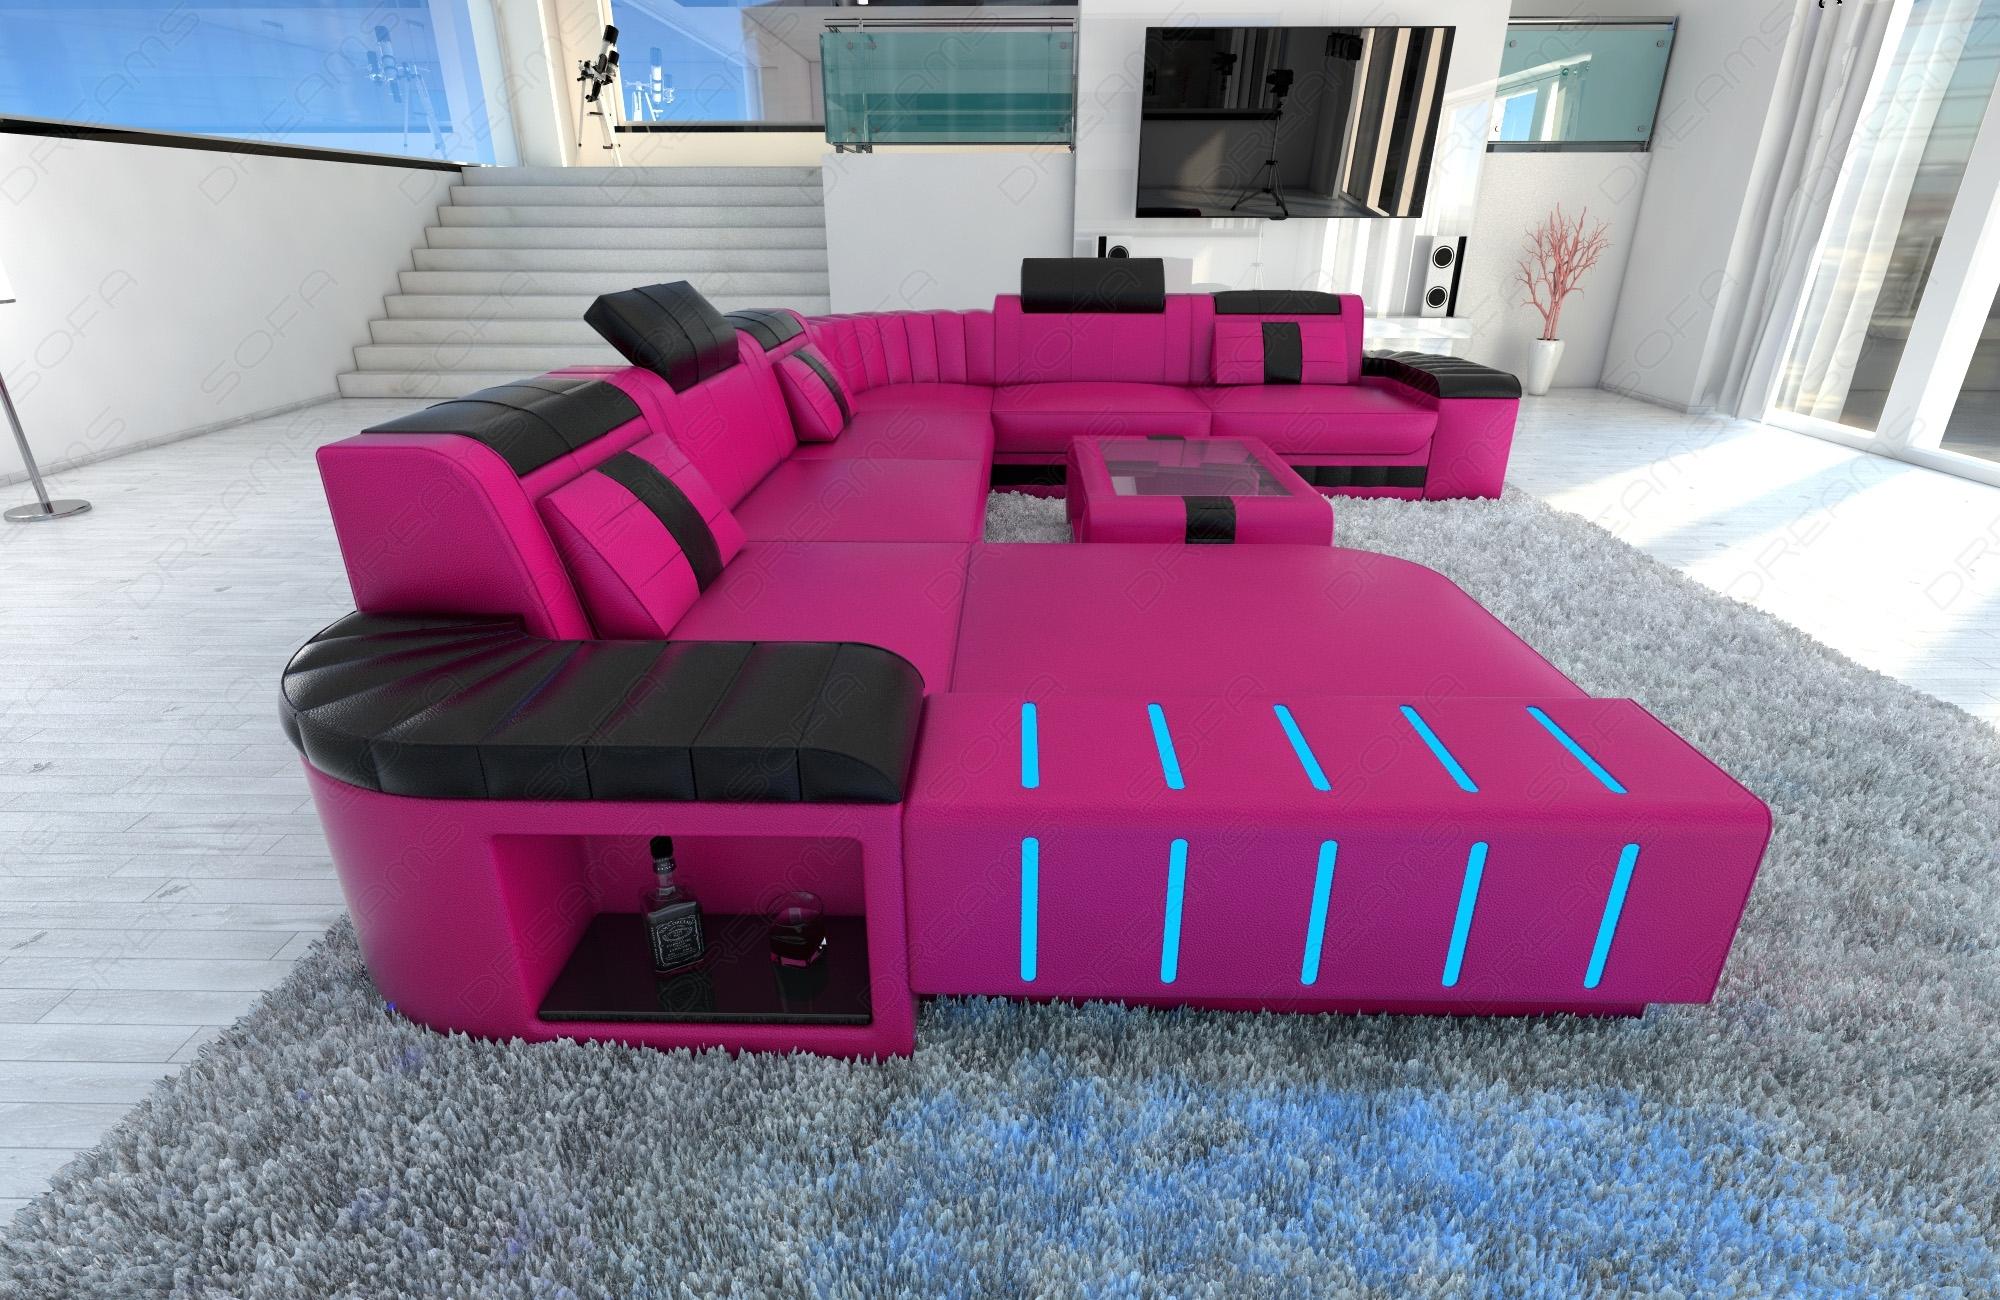 Xxl Sectional Sofa Bellagio Led U Shaped Pink Black Ebay ~ Idolza with regard to Sectional Sofas at Ebay